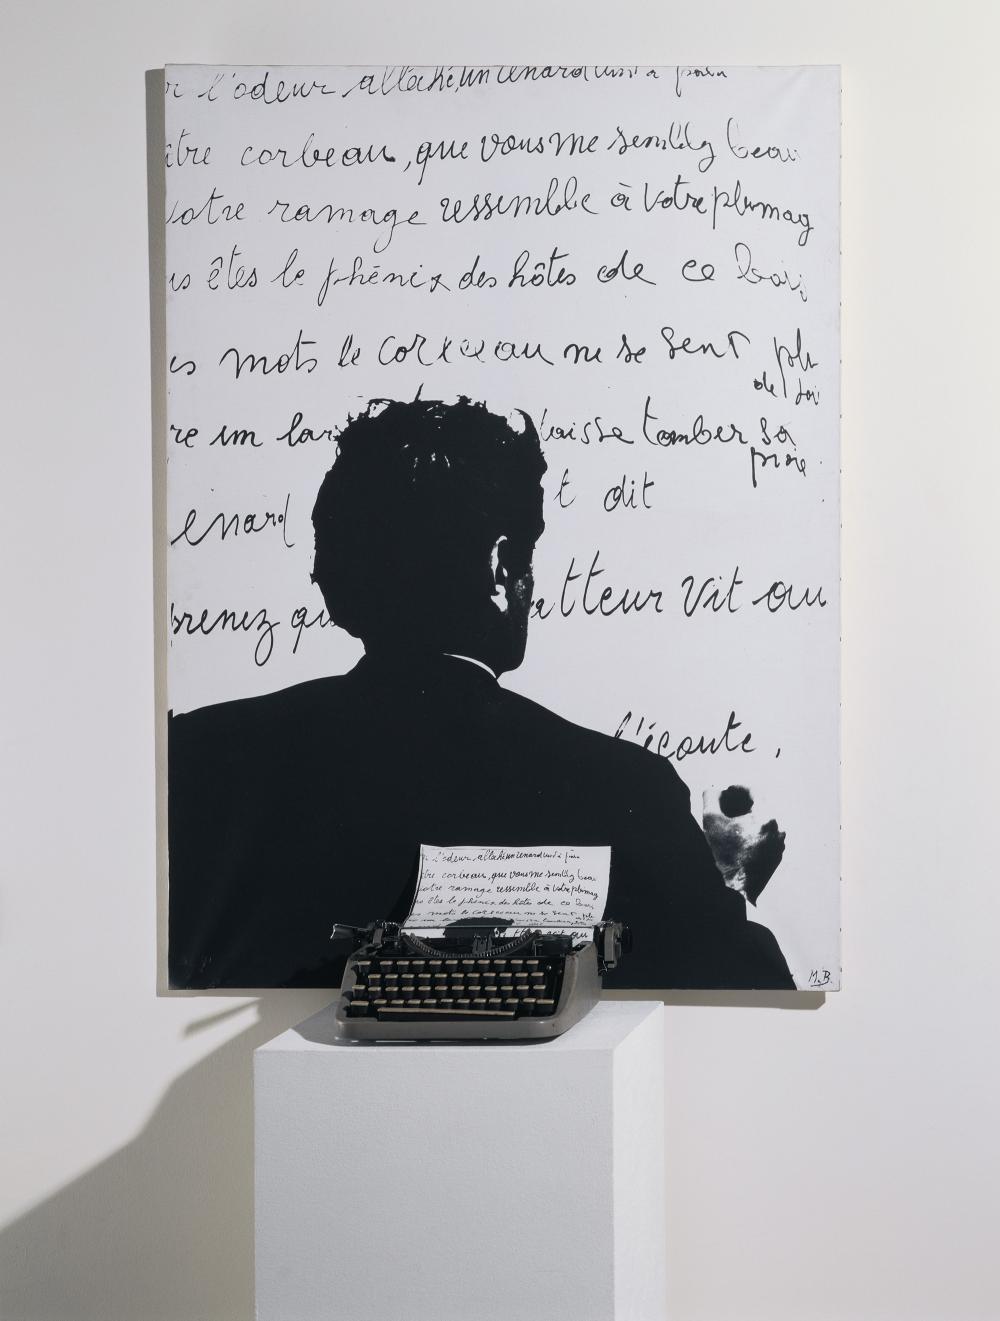 Marcel Broodthaers, Le corbeau et le renard, 1968